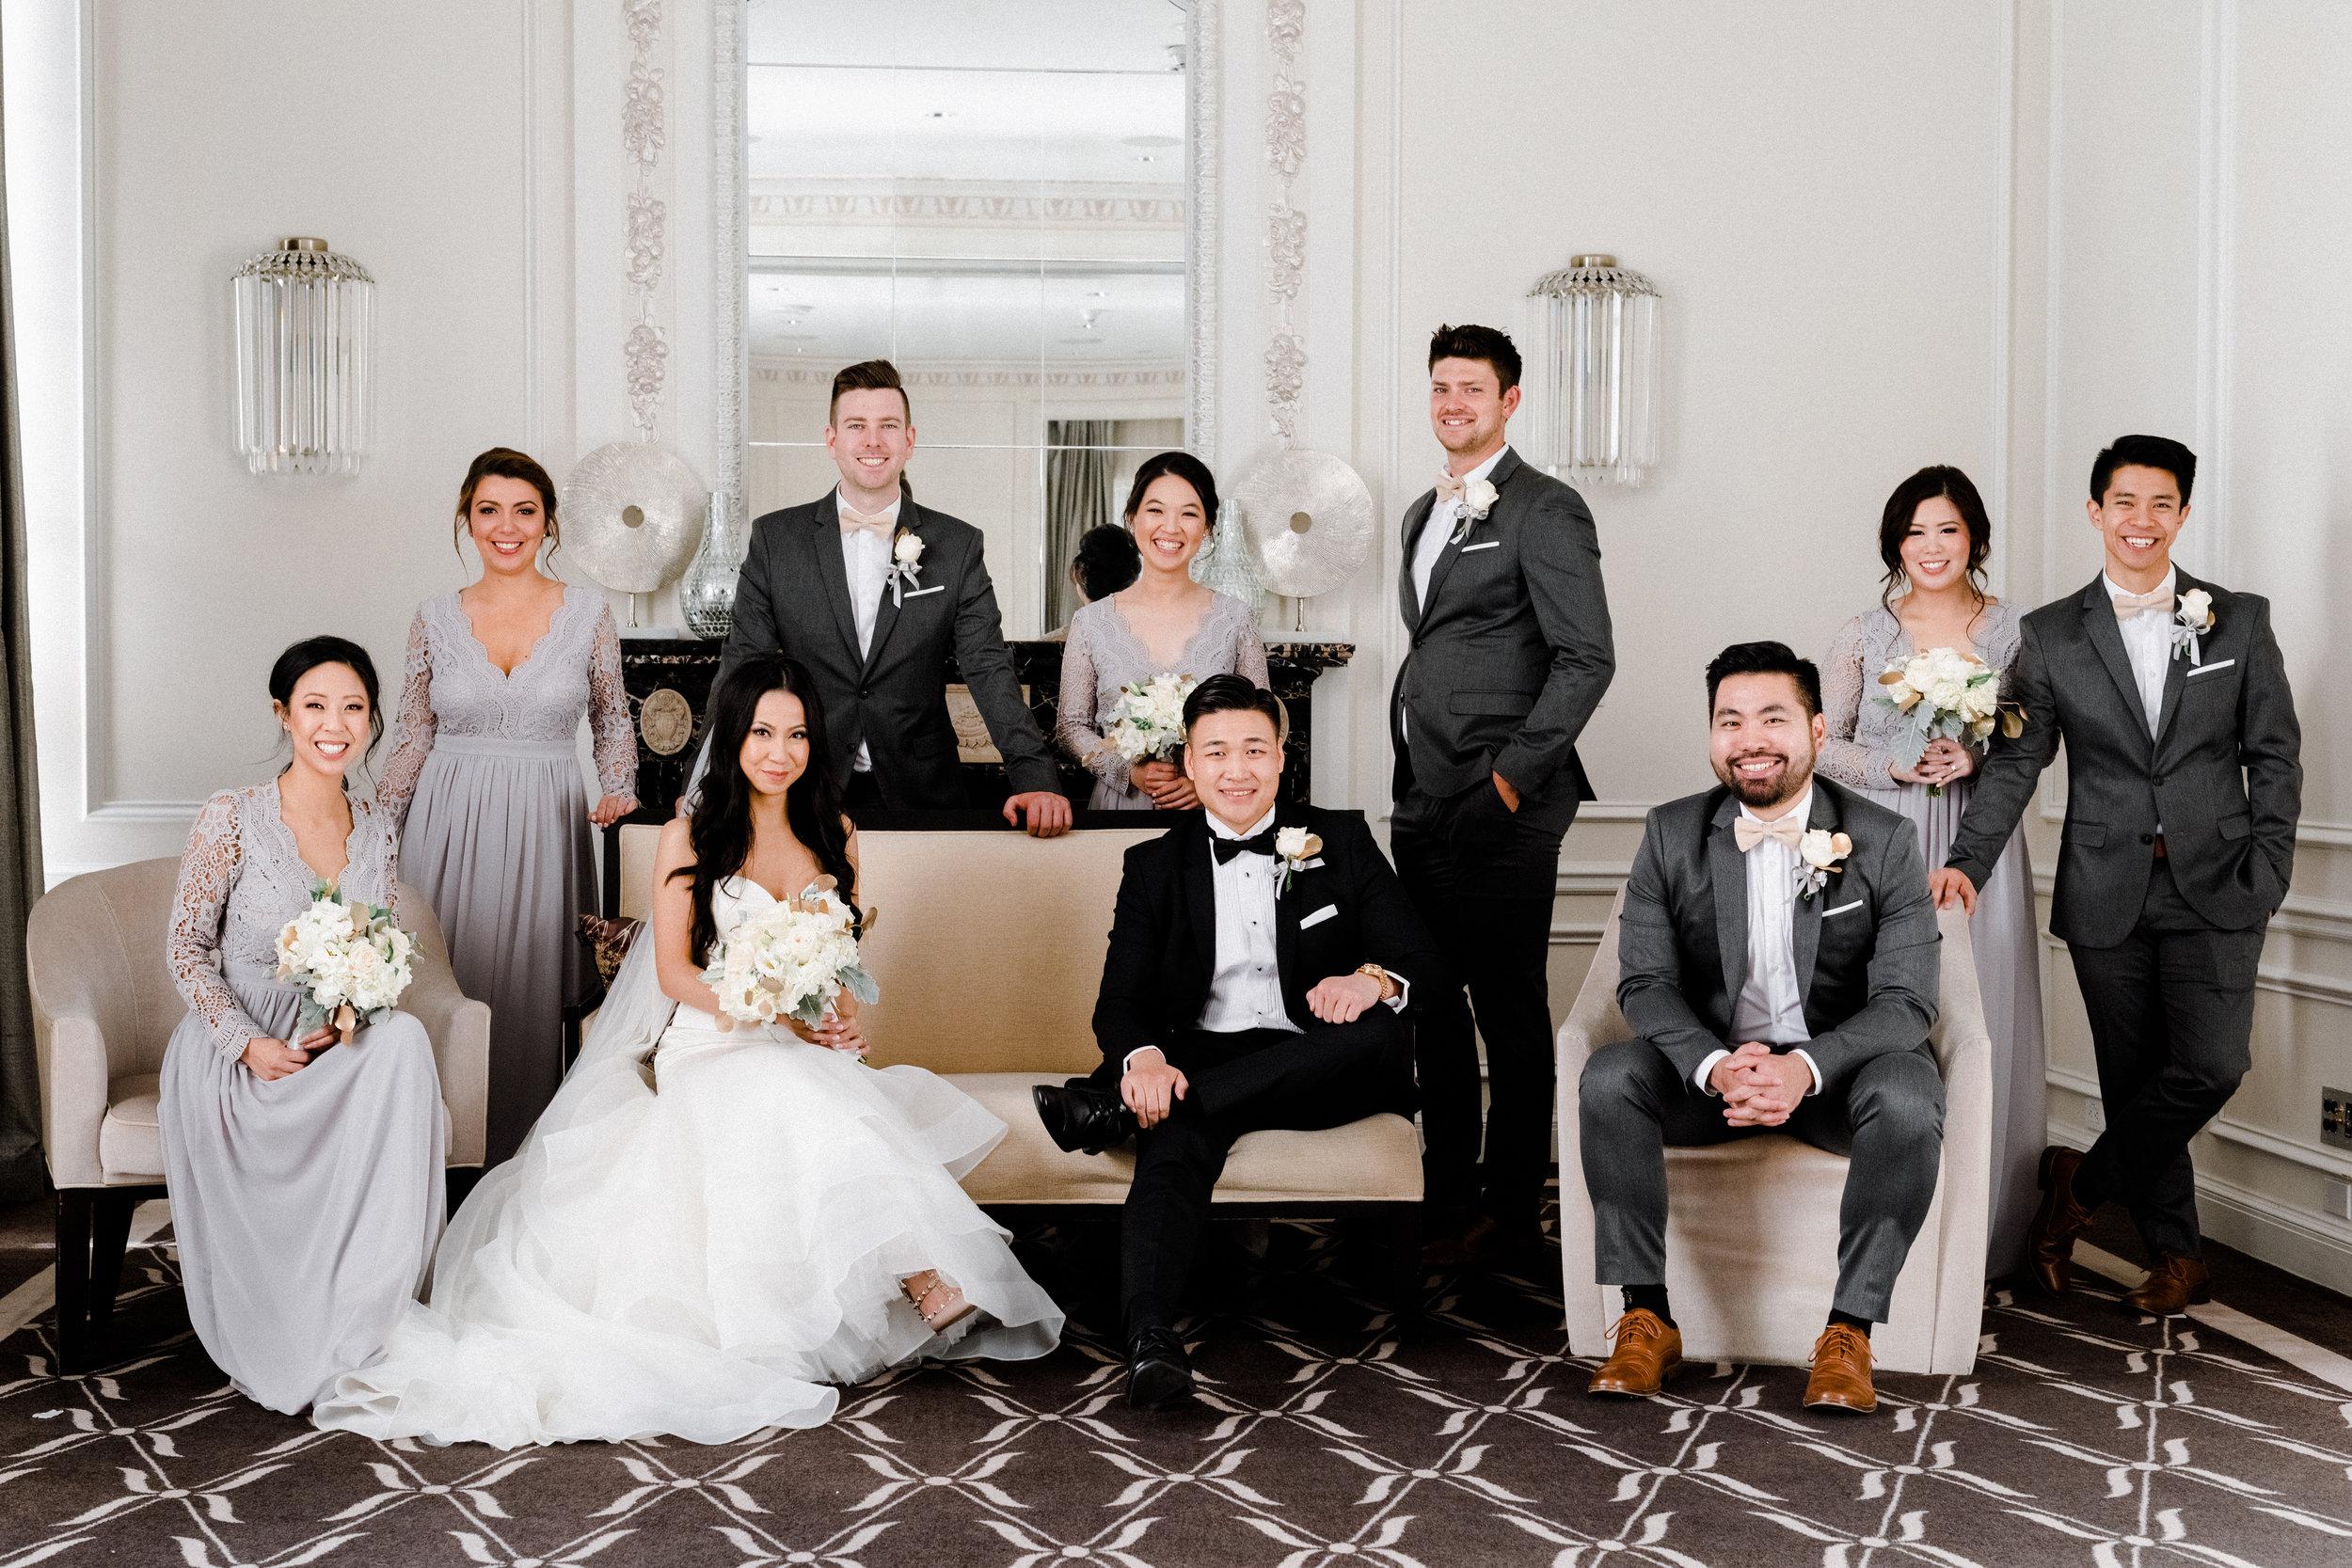 HeraStudios_Selects_Full_KatrinaAndrew_Wedding_Version2-324.jpg